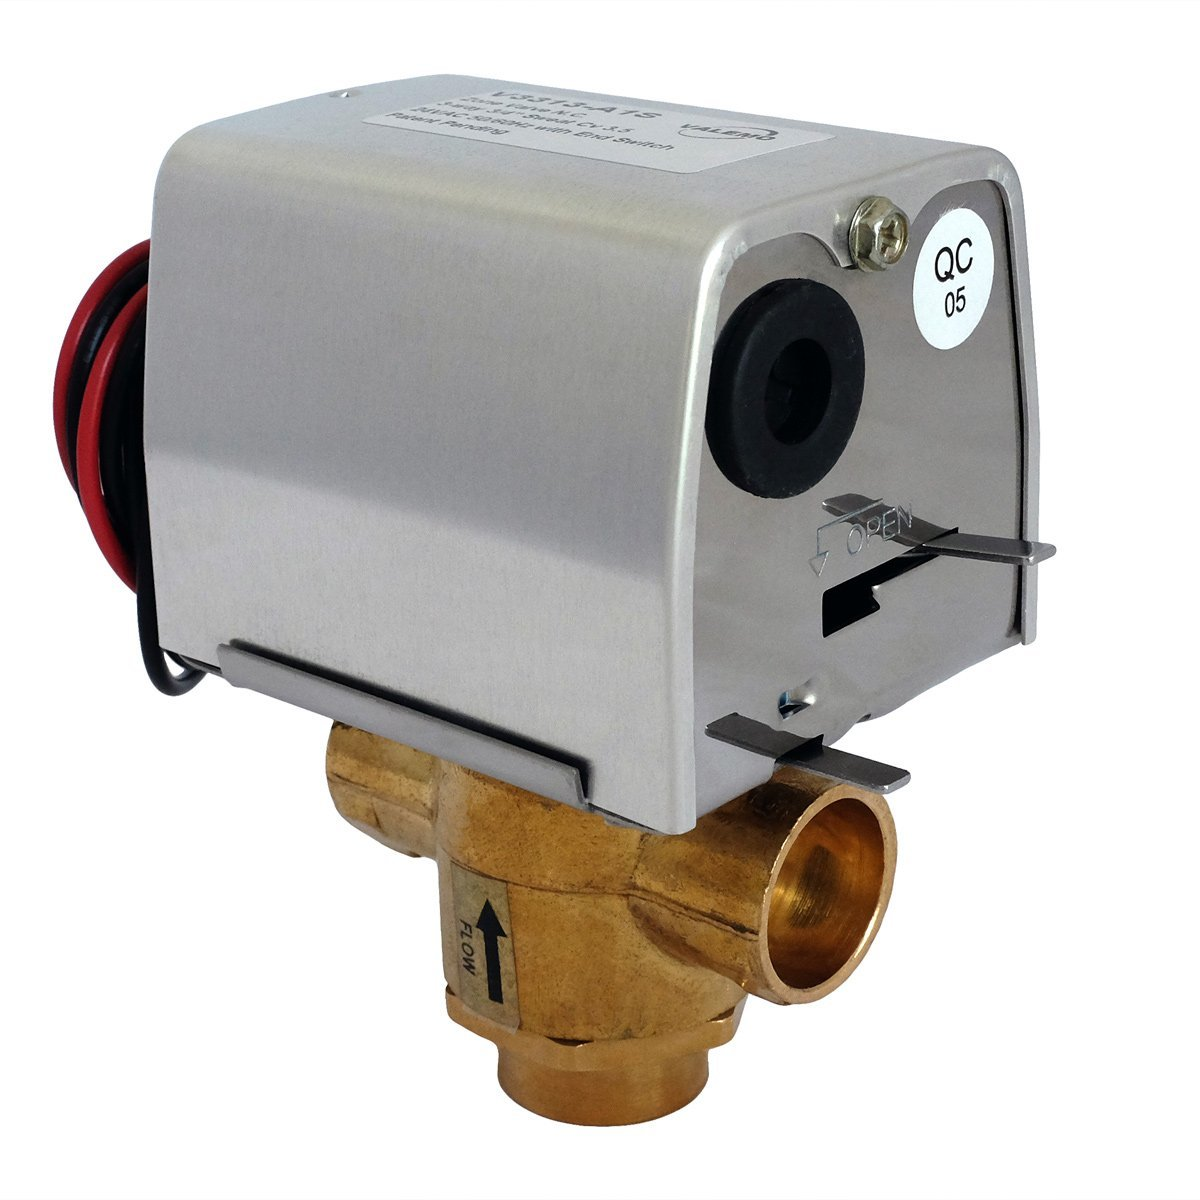 Valemo V3313-A1S Motorized Zone Valve, 3-way 3/4'', Sweat, 24 VAC with End Switch by Valemo Controls (Image #1)